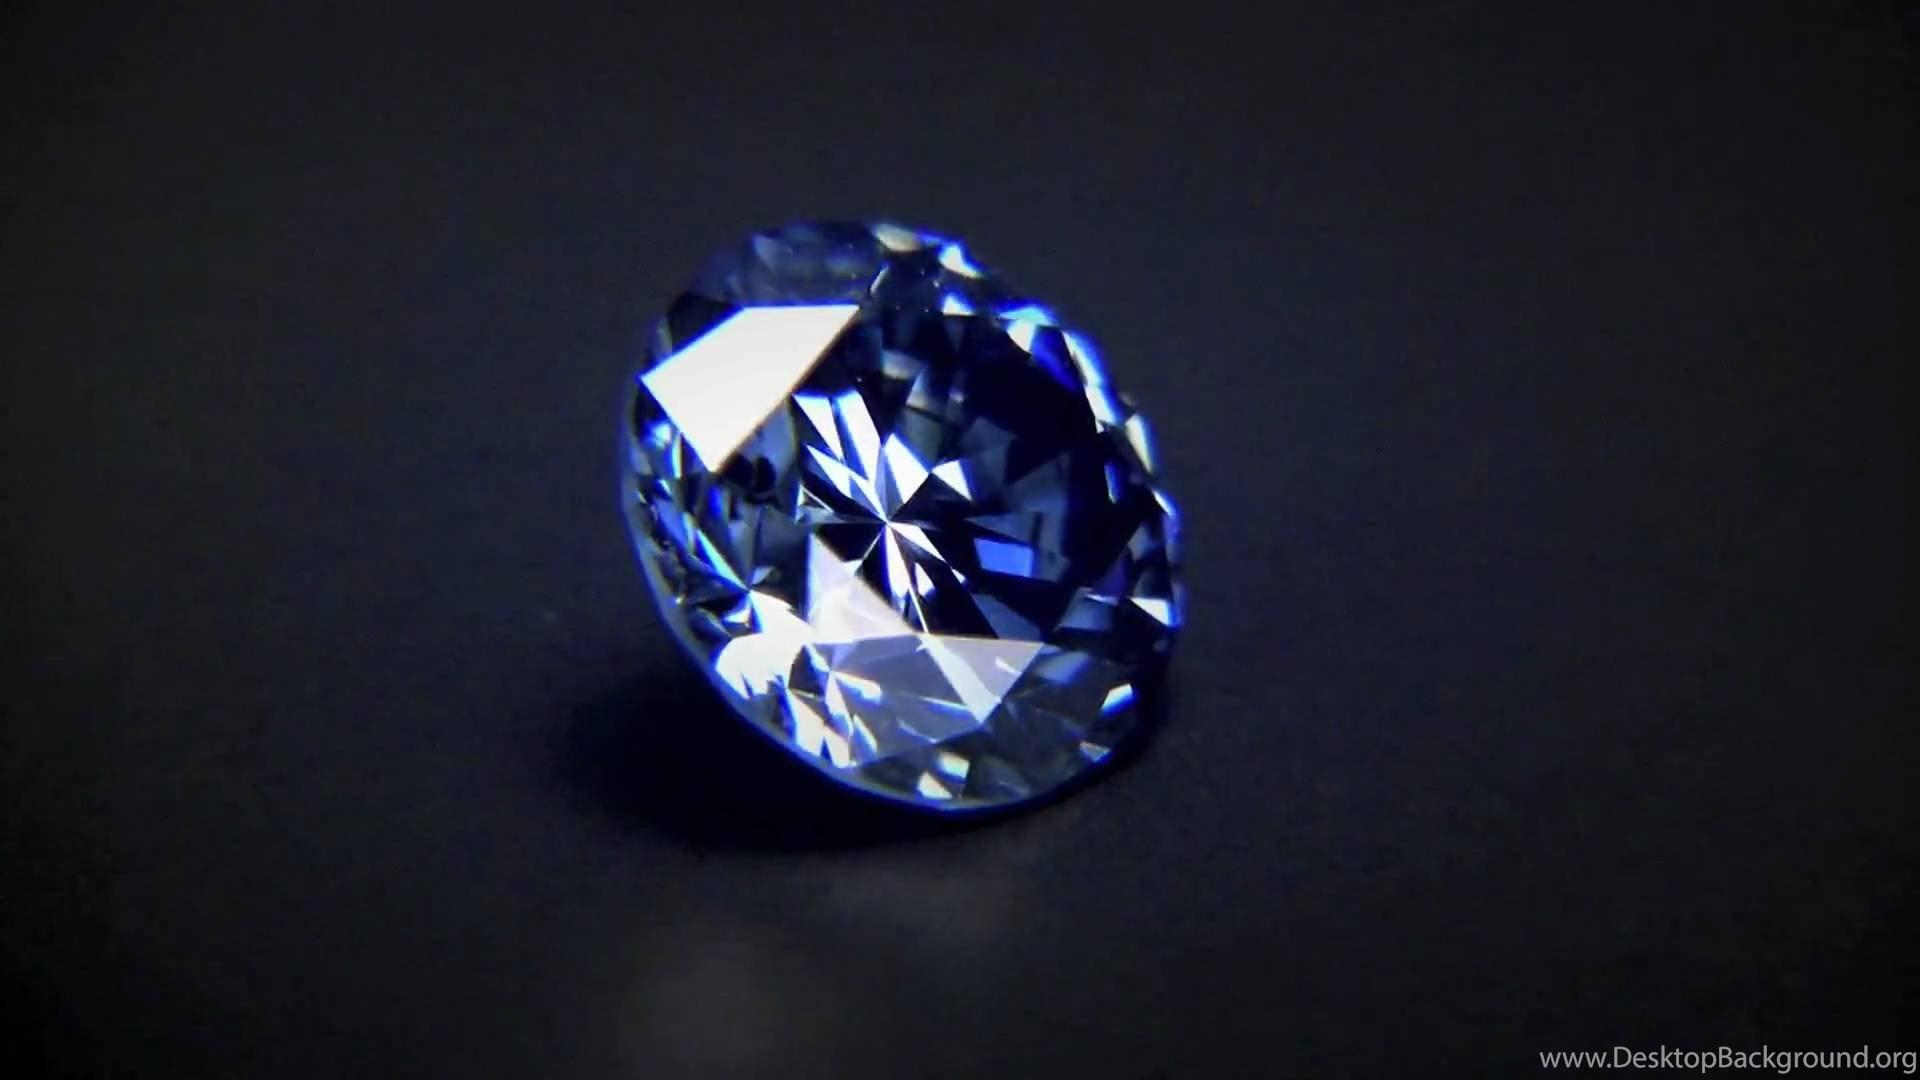 Blue Diamond 70ct Loosemov Youtube Desktop Background